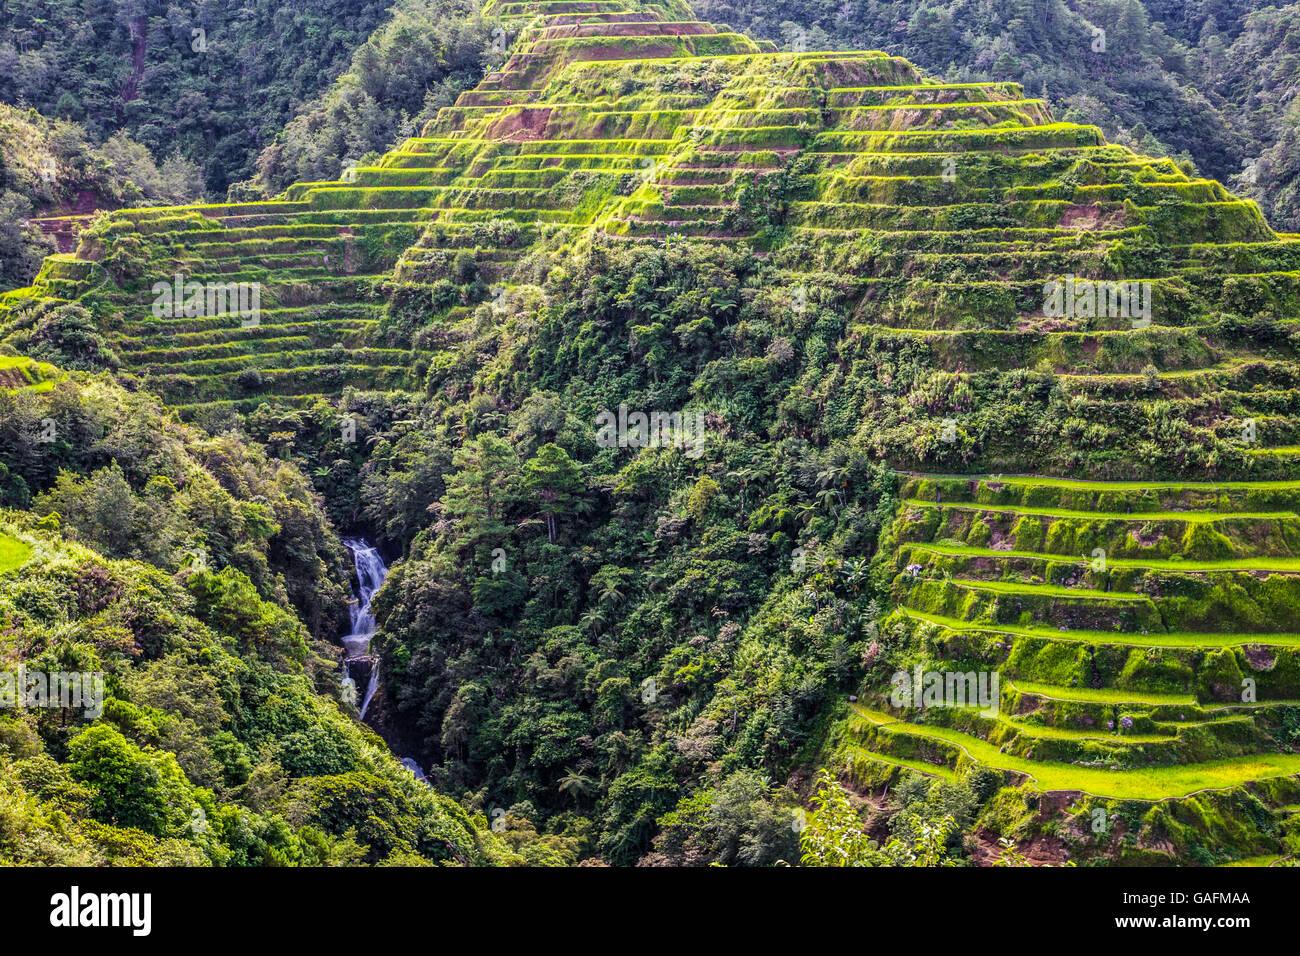 Banaue Rice Terraces represent an enduring illustration of an ancient civilization that has survived despite modernization - Stock Image